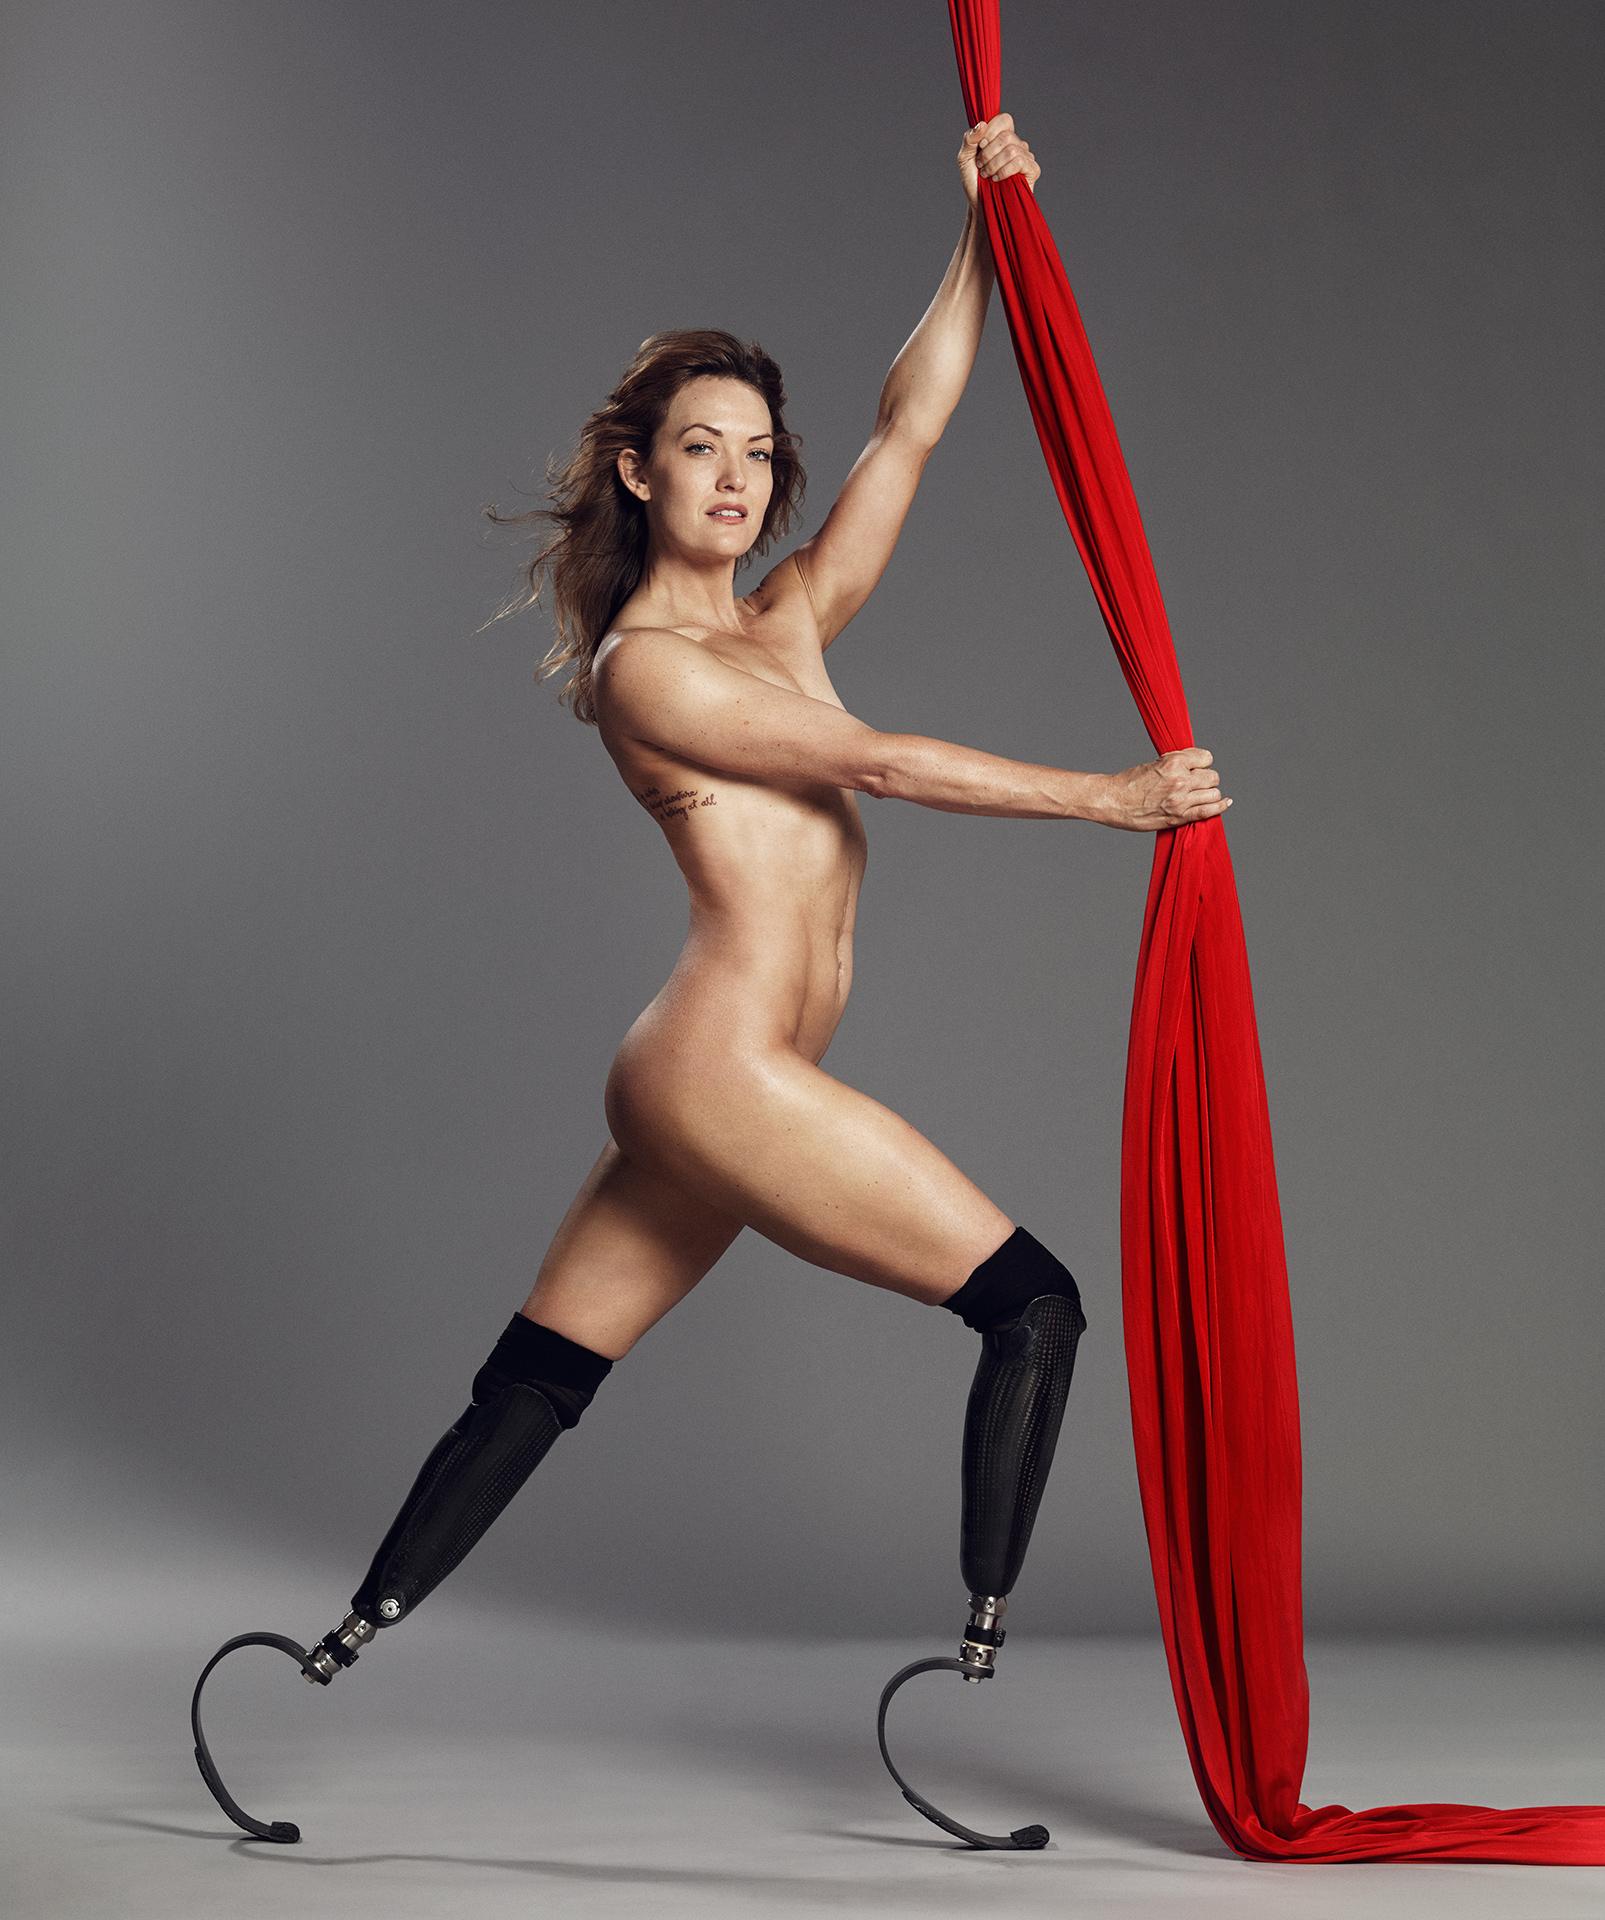 Amy Purdy, Amy Purdy Nude, Amy Purdy The Body Issue